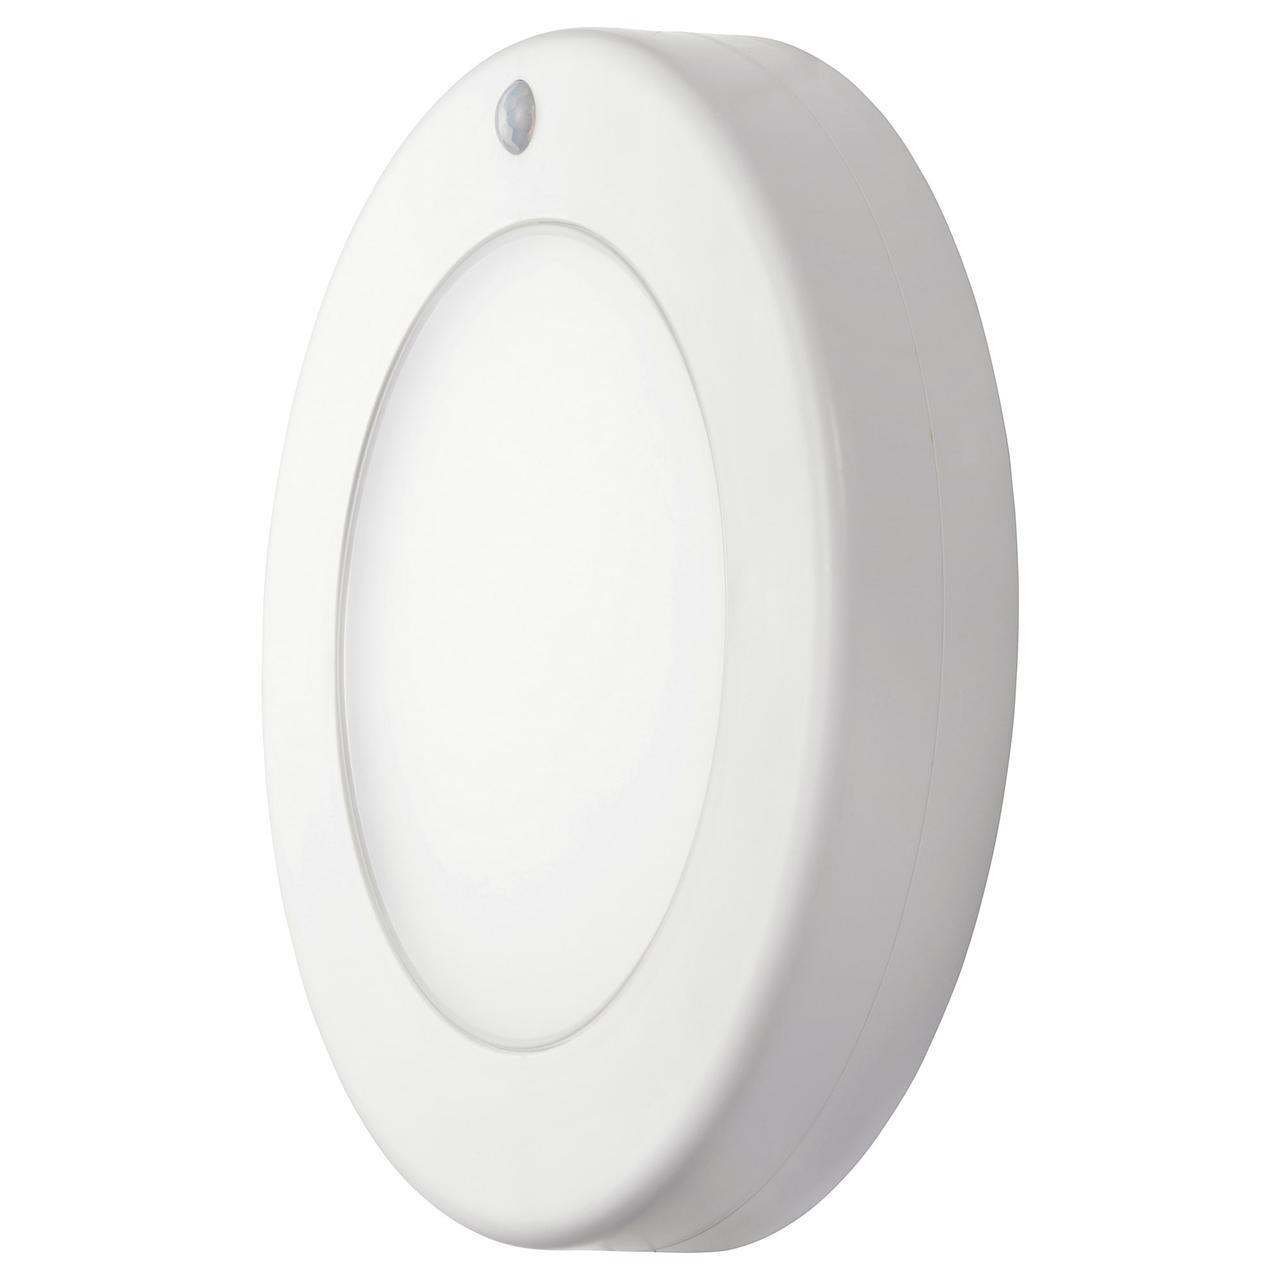 IKEA STOTTA (602.771.37) Светодиодная лампа на потолке/на стене, белый